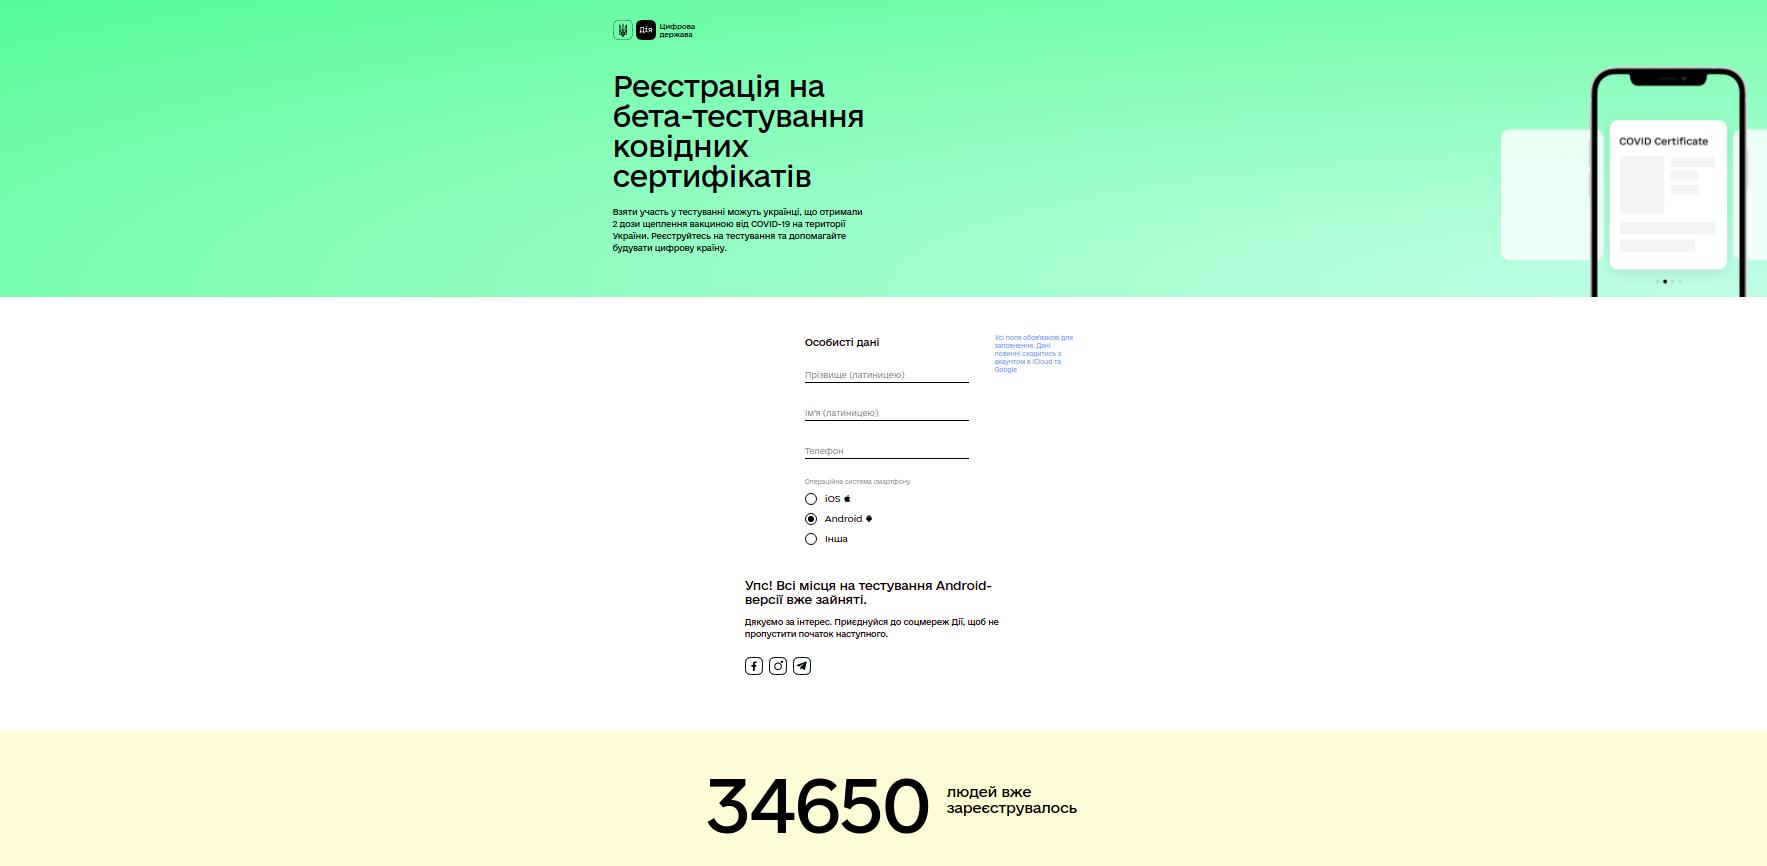 Фото: скриншот сайта team.diia.gov.ua